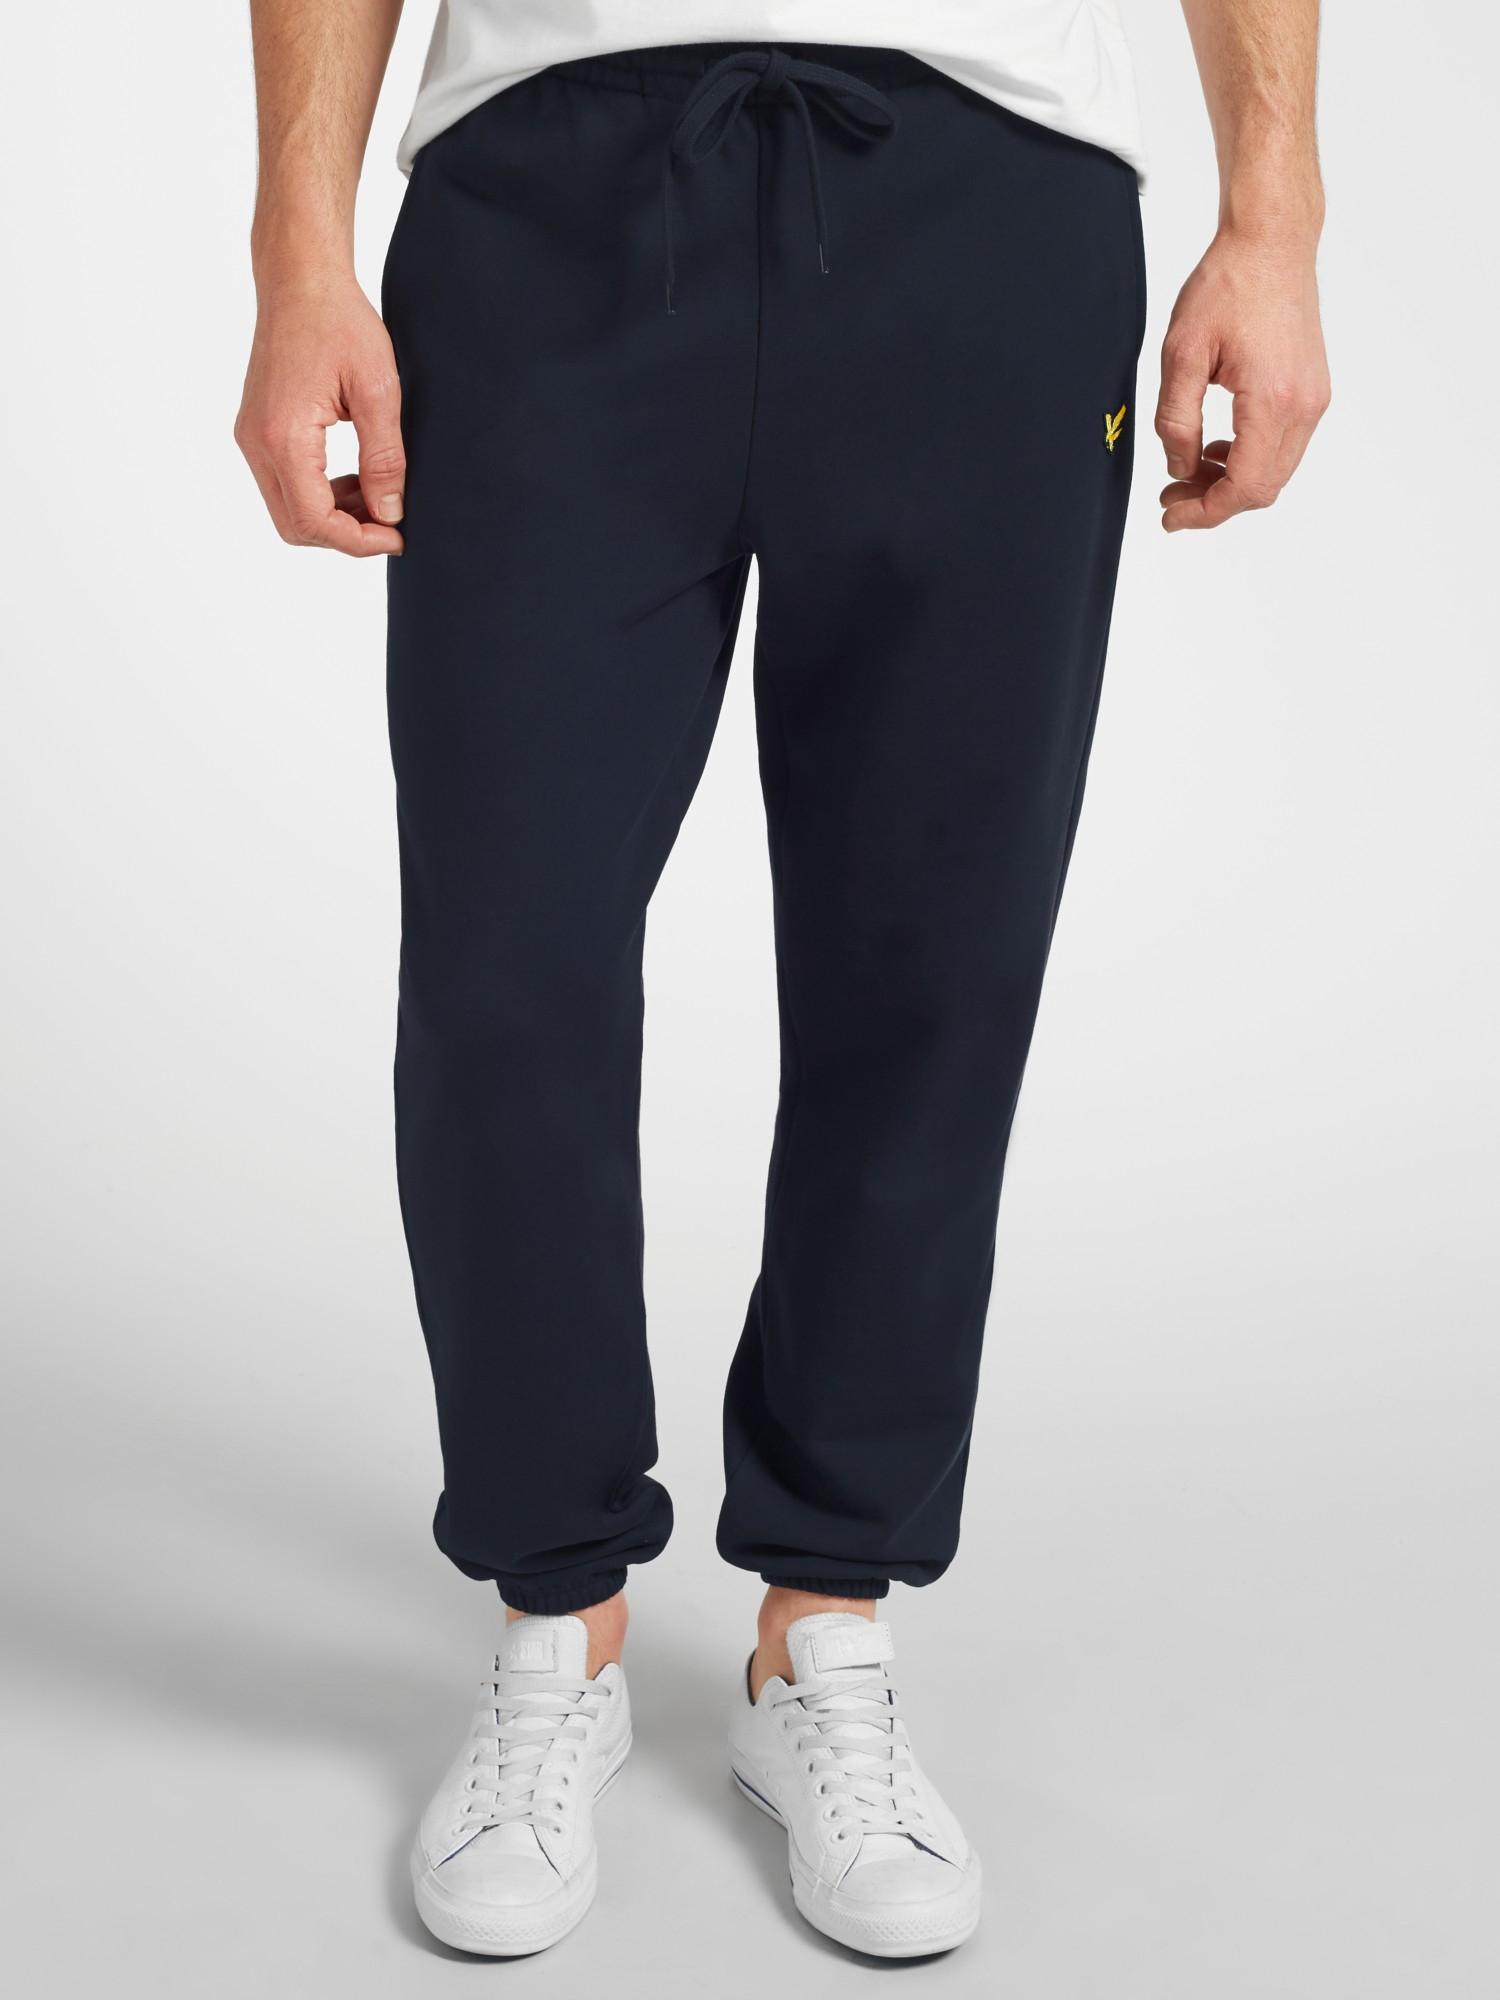 1d1cc69a Lyle & Scott Cuffed Sweat Pants in Blue for Men - Lyst